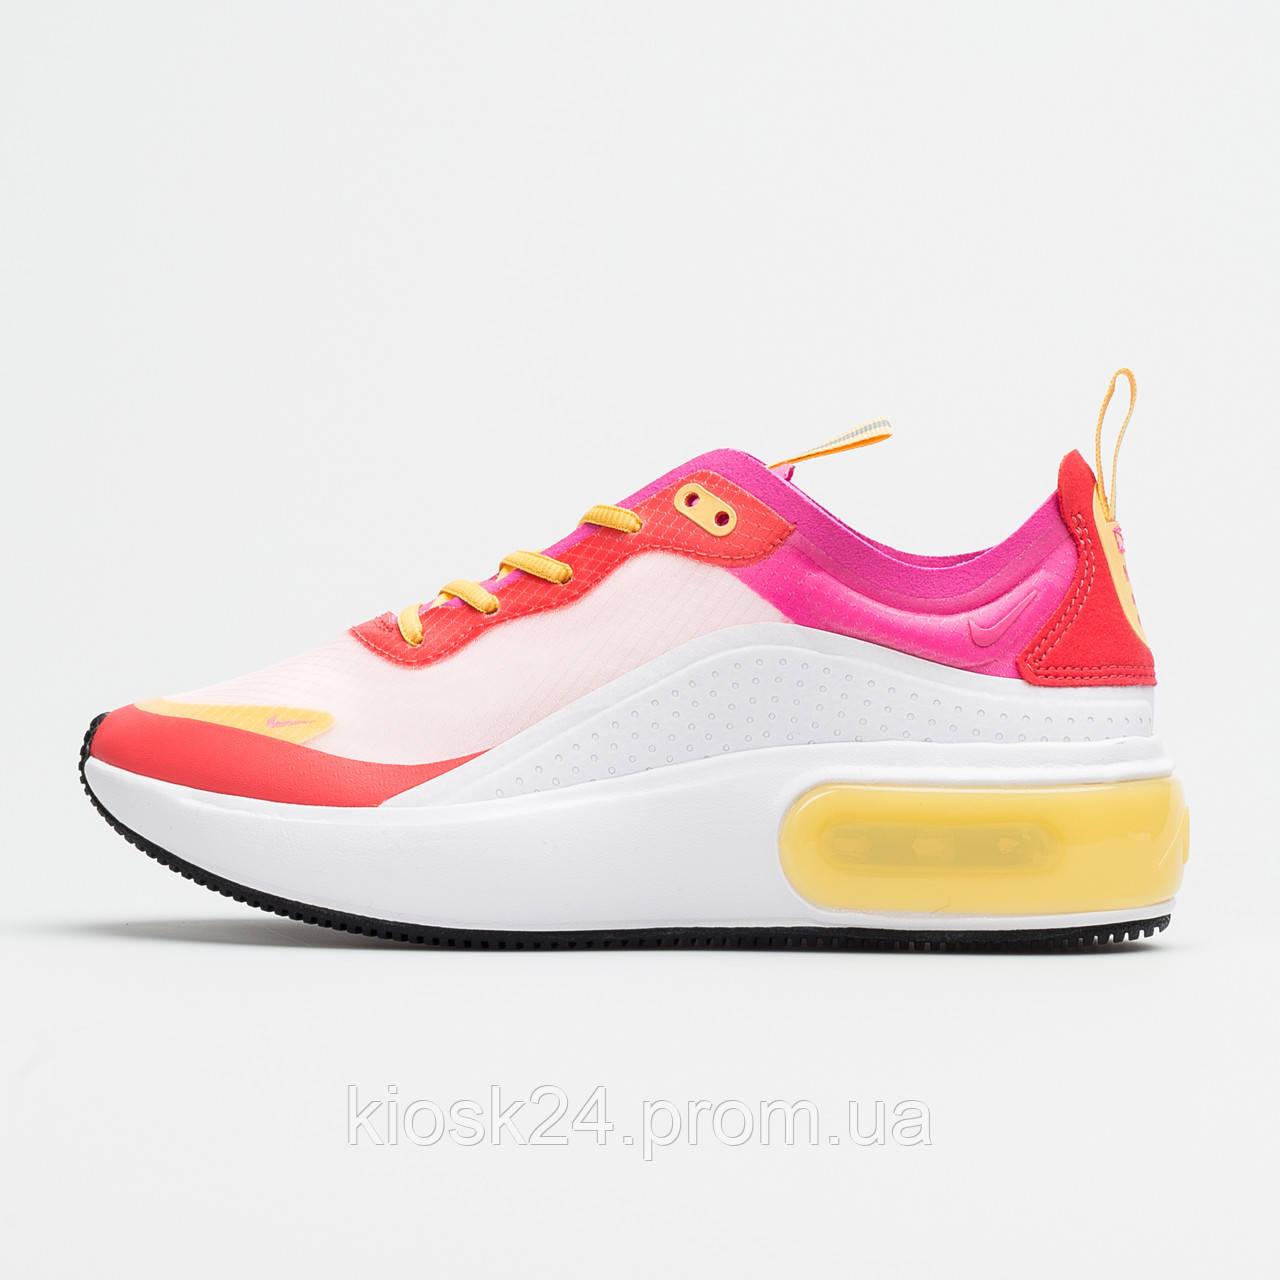 431096d4 Оригинальные кроссовки Nike Wmns Air Max Dia SE (AR7410-102 ...